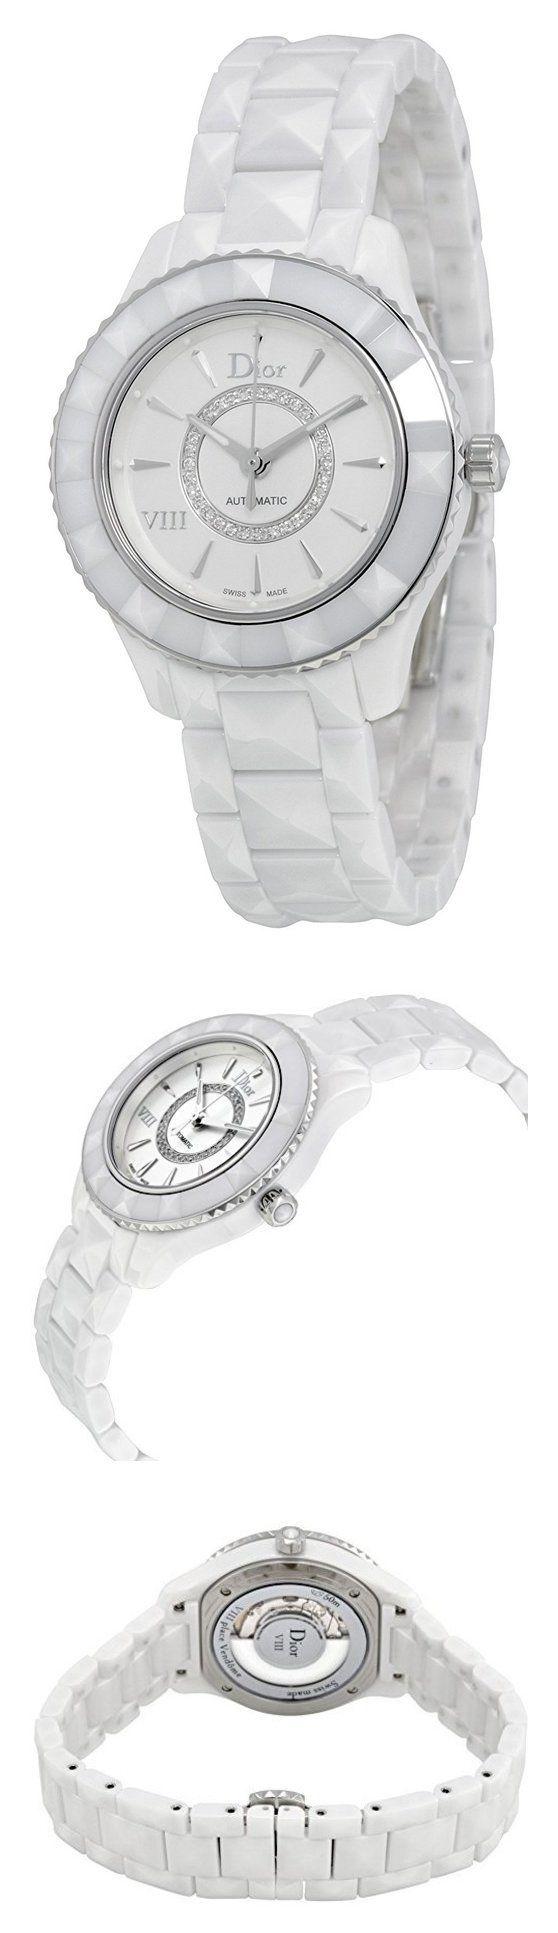 Christian Dior VIII White Diamond-set Dial White Ceramic Ladies Watch CD1235E3C001 #watch #christiandior #wrist_watches #watches #women #departments #shops